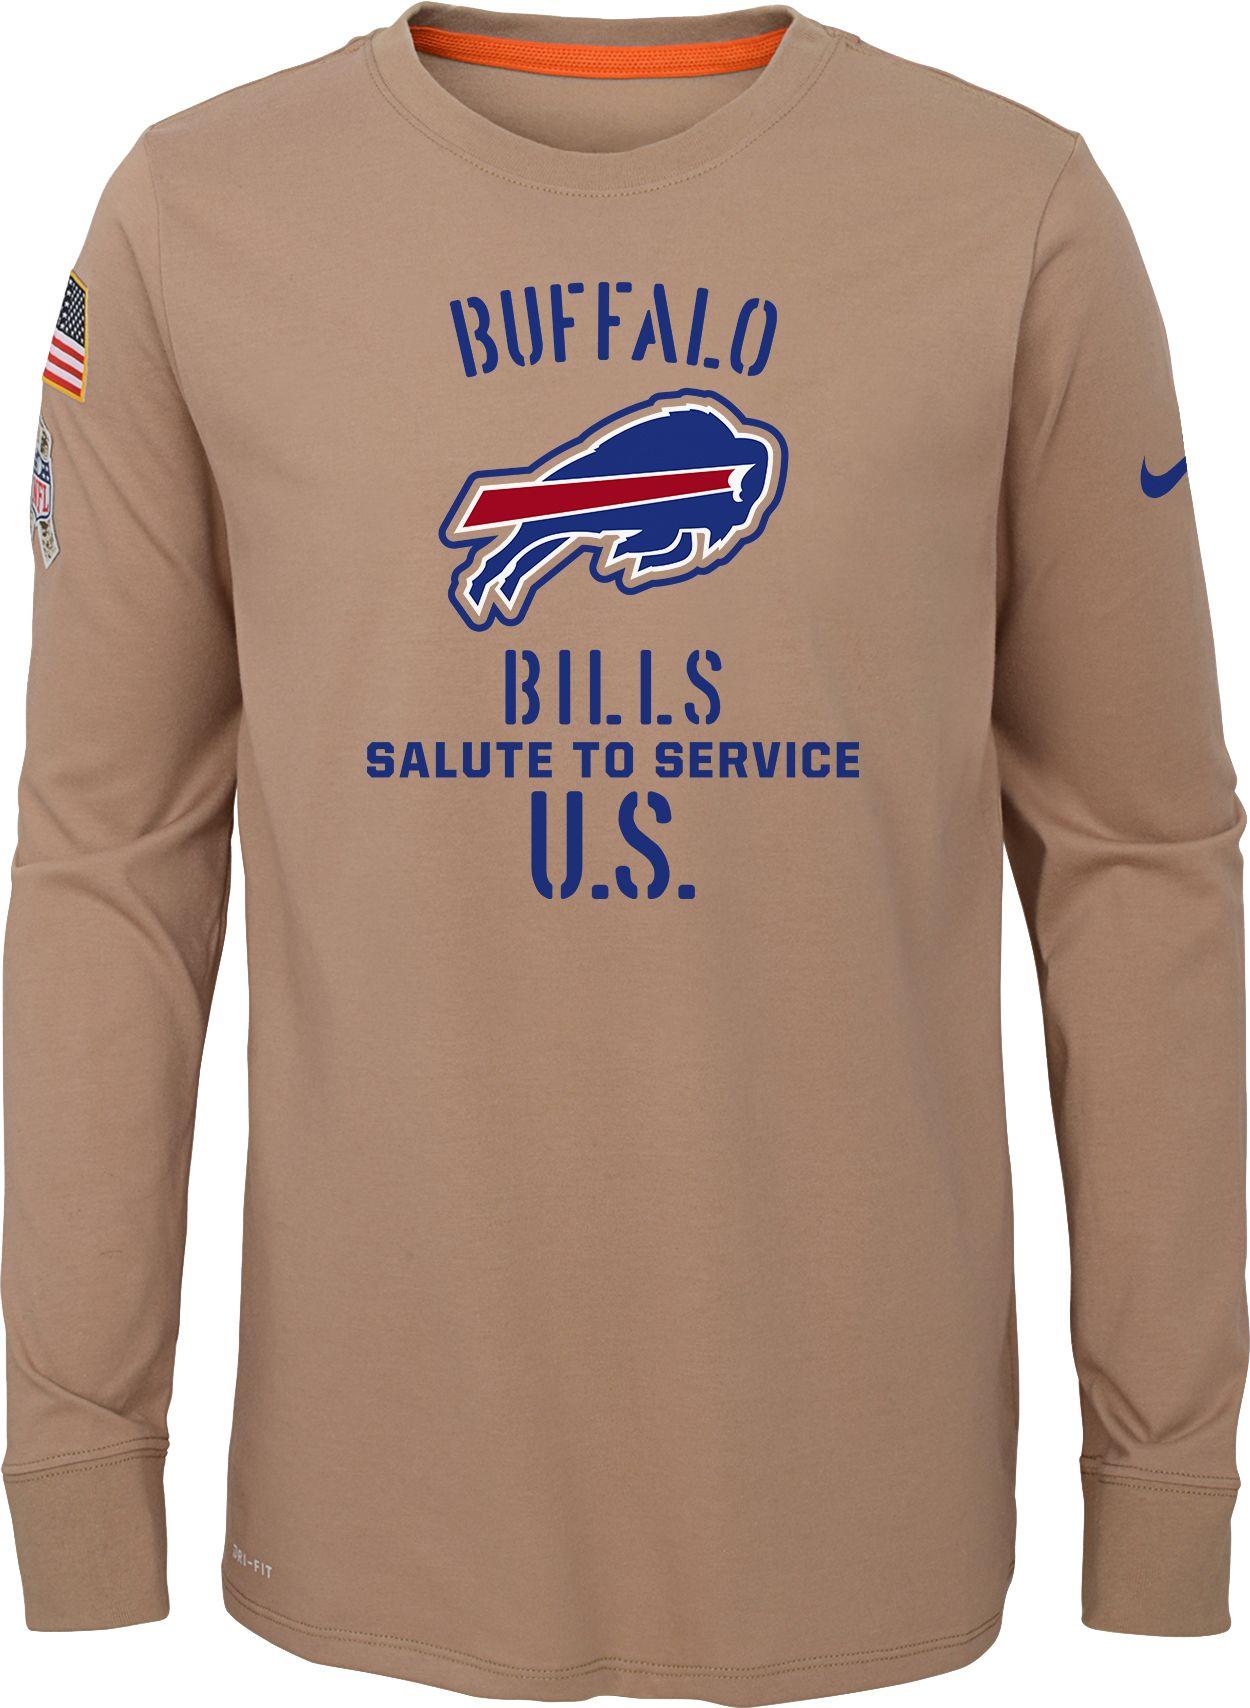 buffalo bills youth sweatshirt